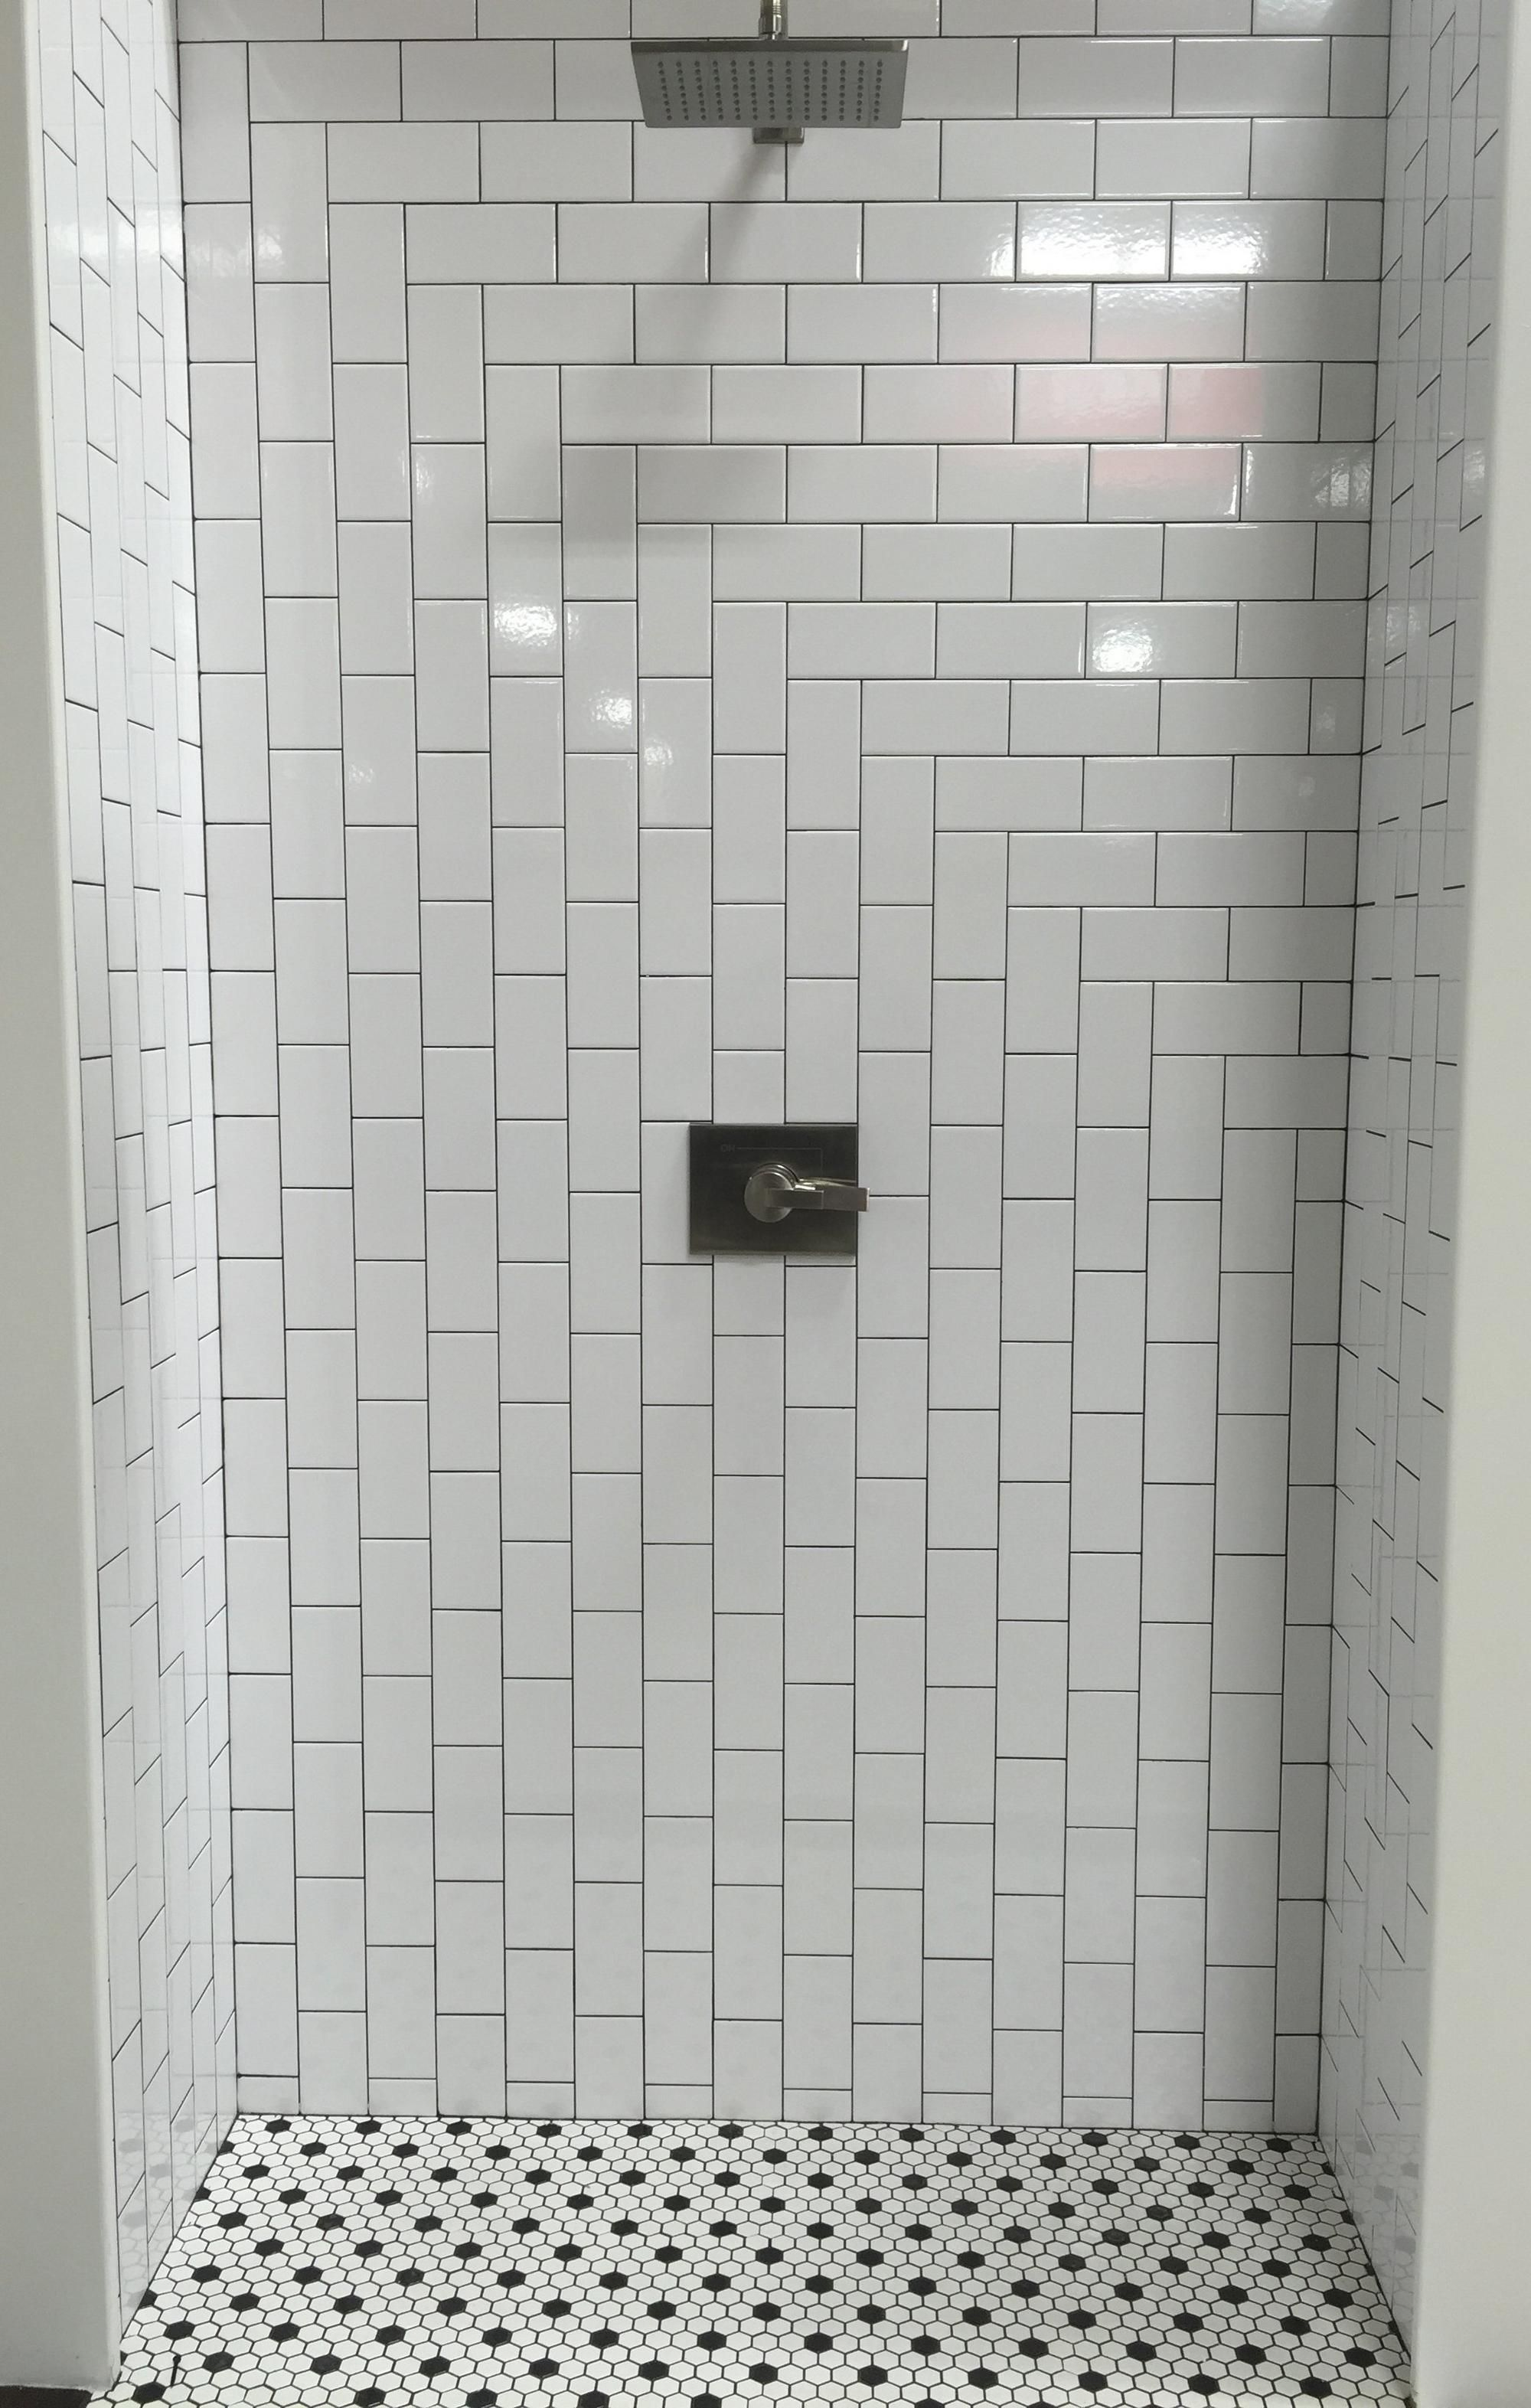 Bright White Ice Subway Ceramic Wall Tile Floor Decor Bathroom Wall Tile Tile Bathroom Shower Tile Designs